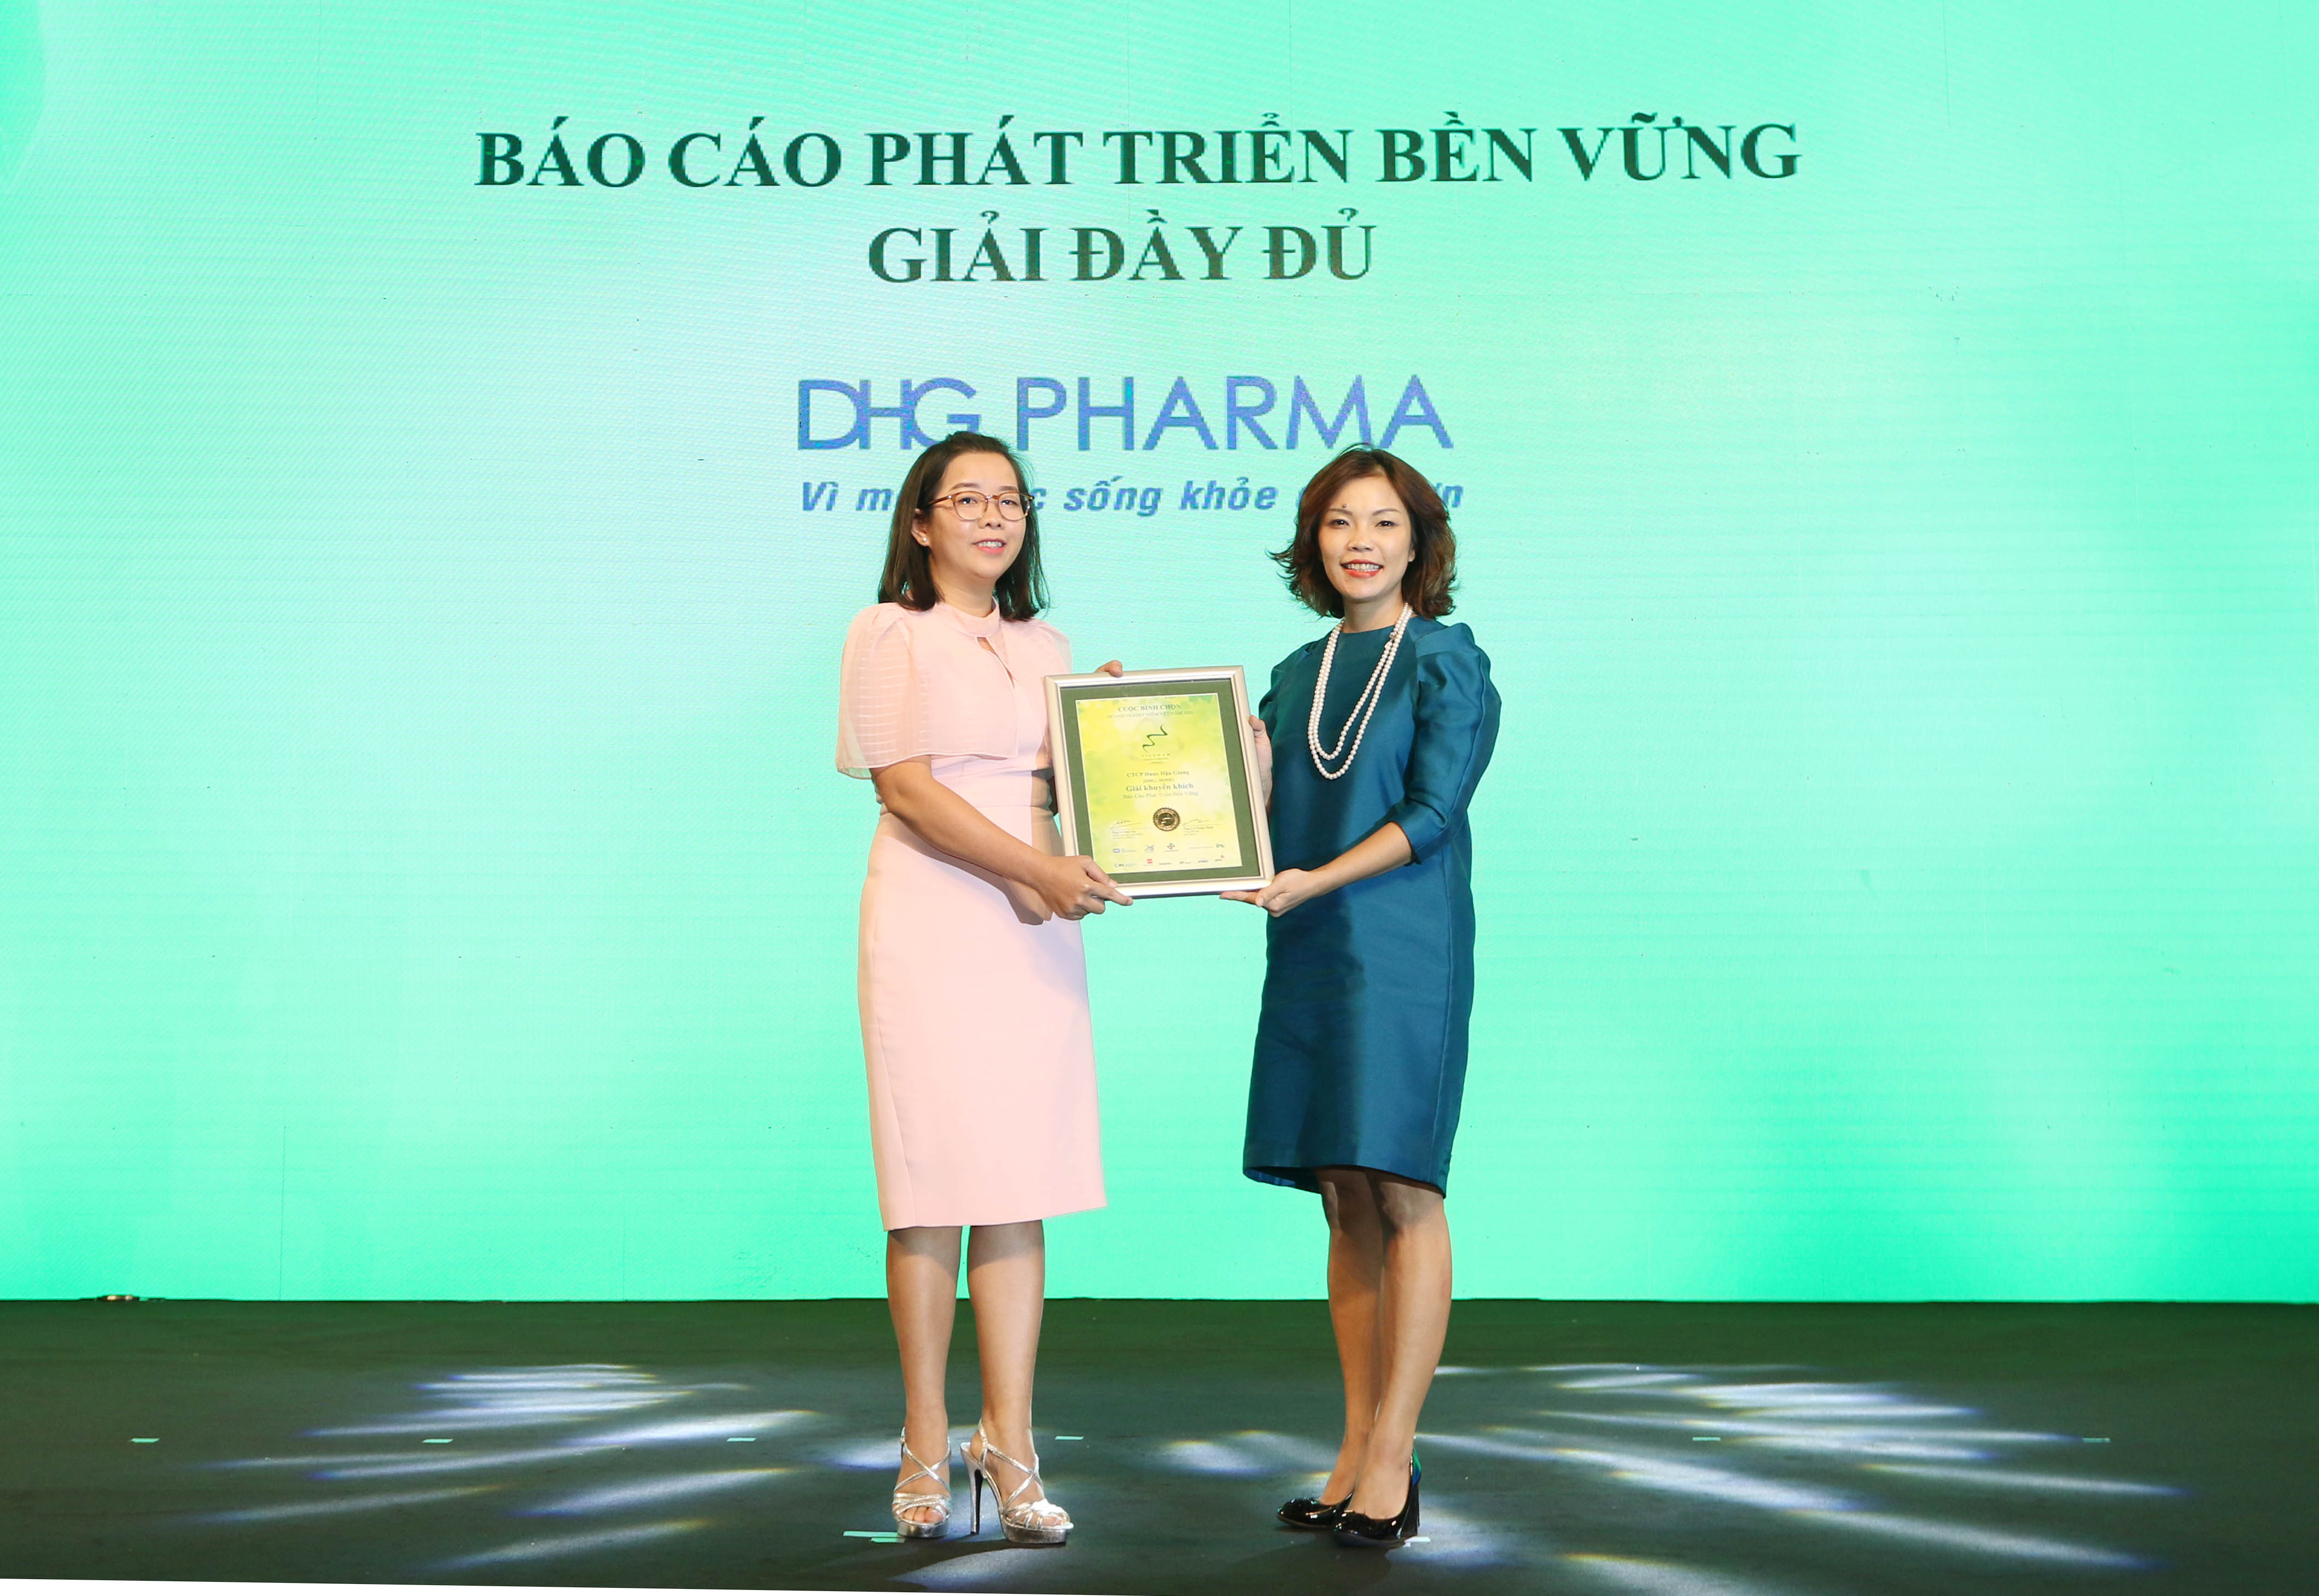 https://www.aravietnam.vn/wp-content/uploads/2020/12/61_Dại-diện-DHG-Pharma-nhận-giải-khuyến-khích.jpg